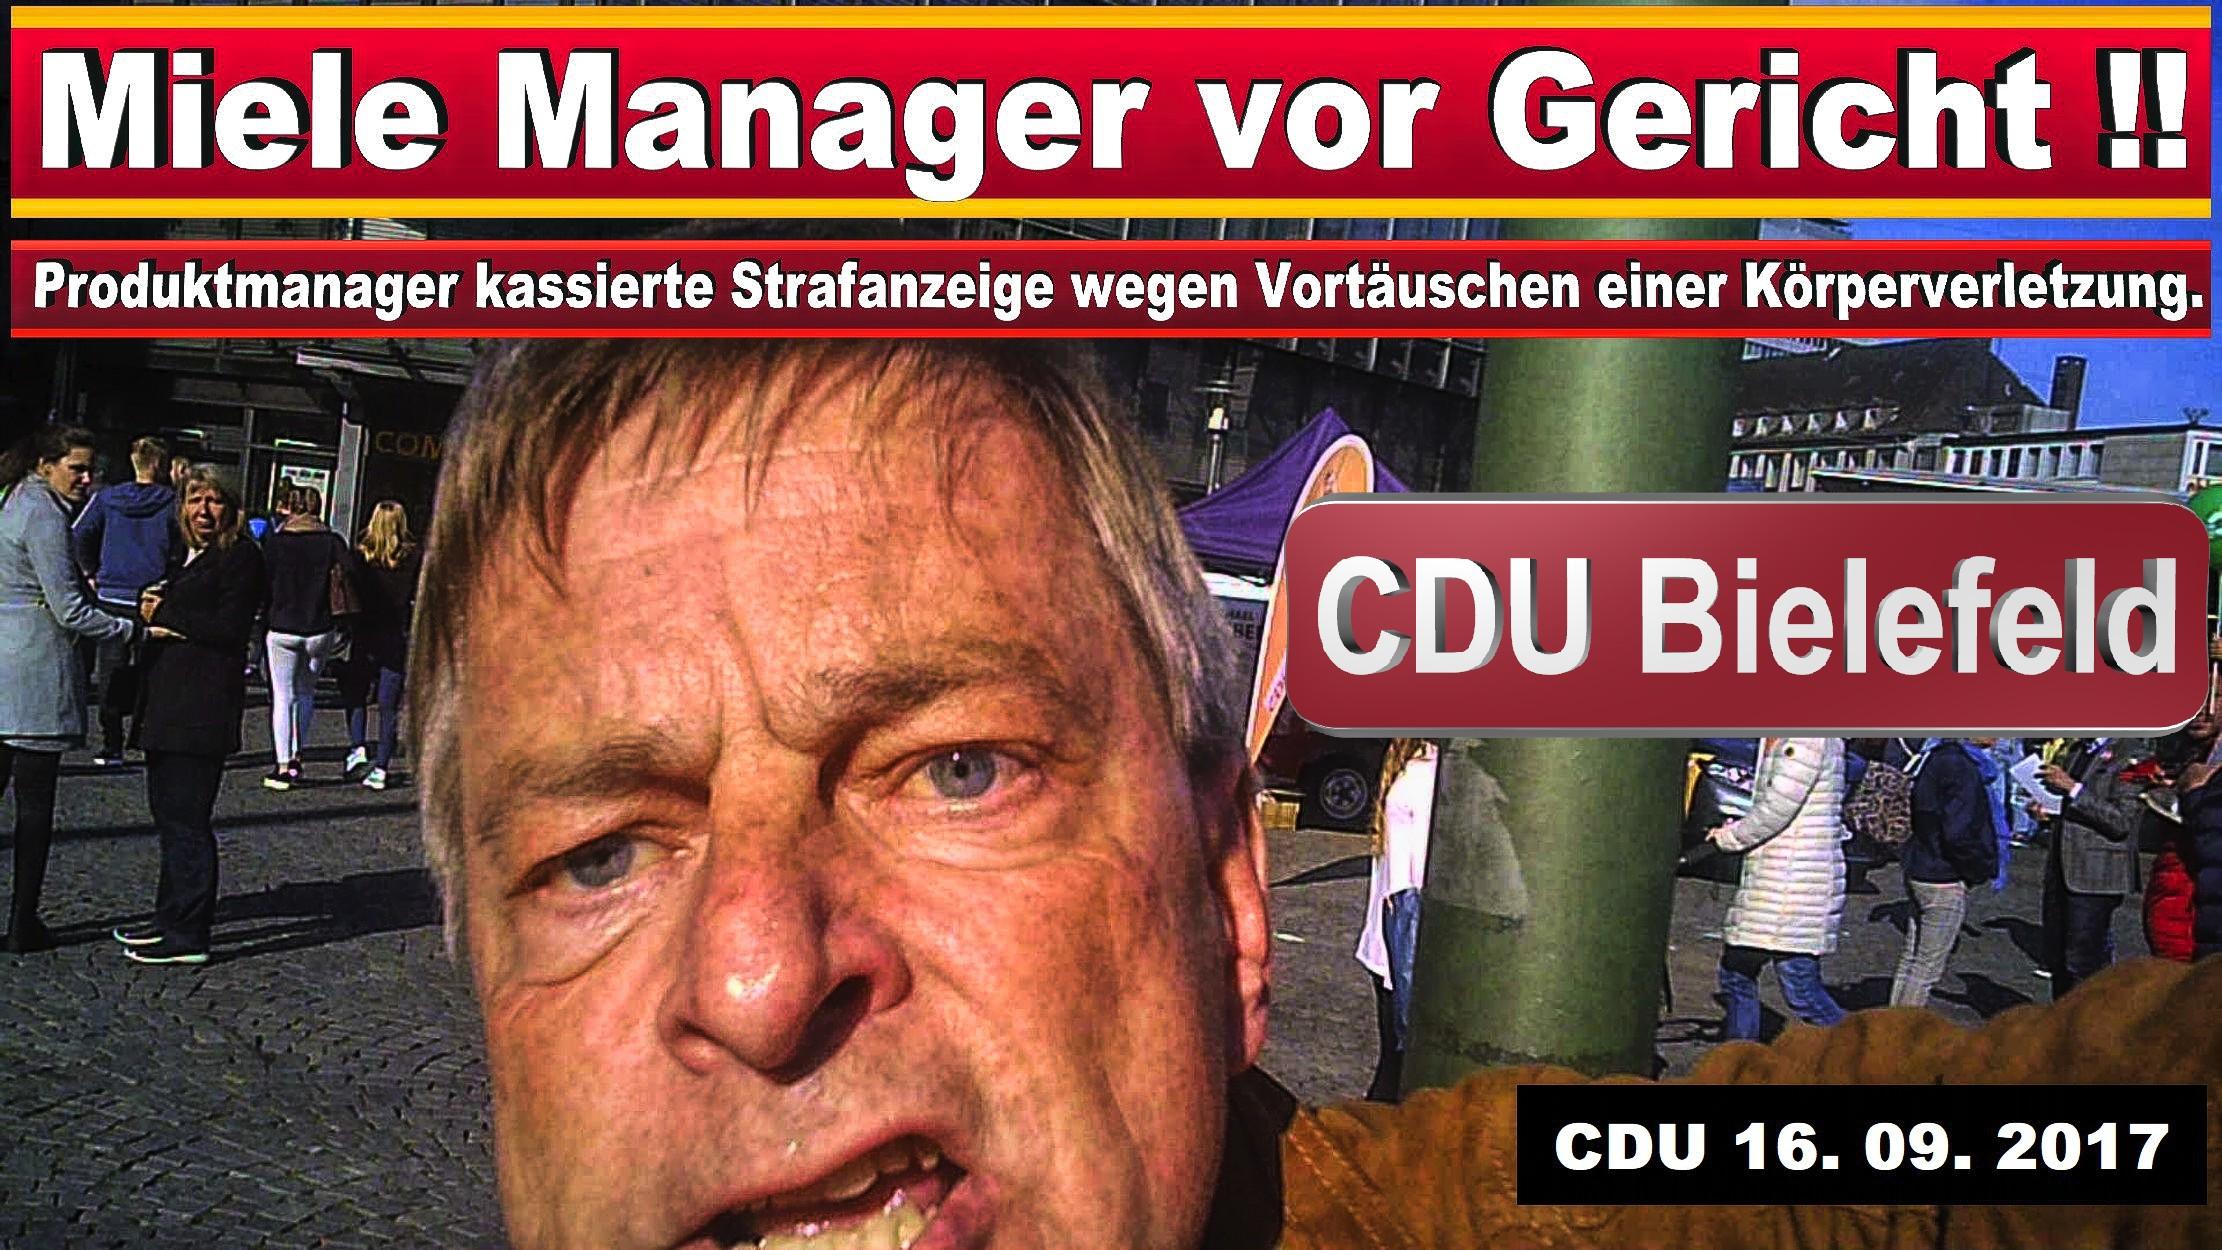 CDU MITGLIEDER BIELEFELD MICHAEL WEBER MIELE GüTERSLOH PRODUKTMANAGER JURIST SPD FDP AFD BIELEFELD